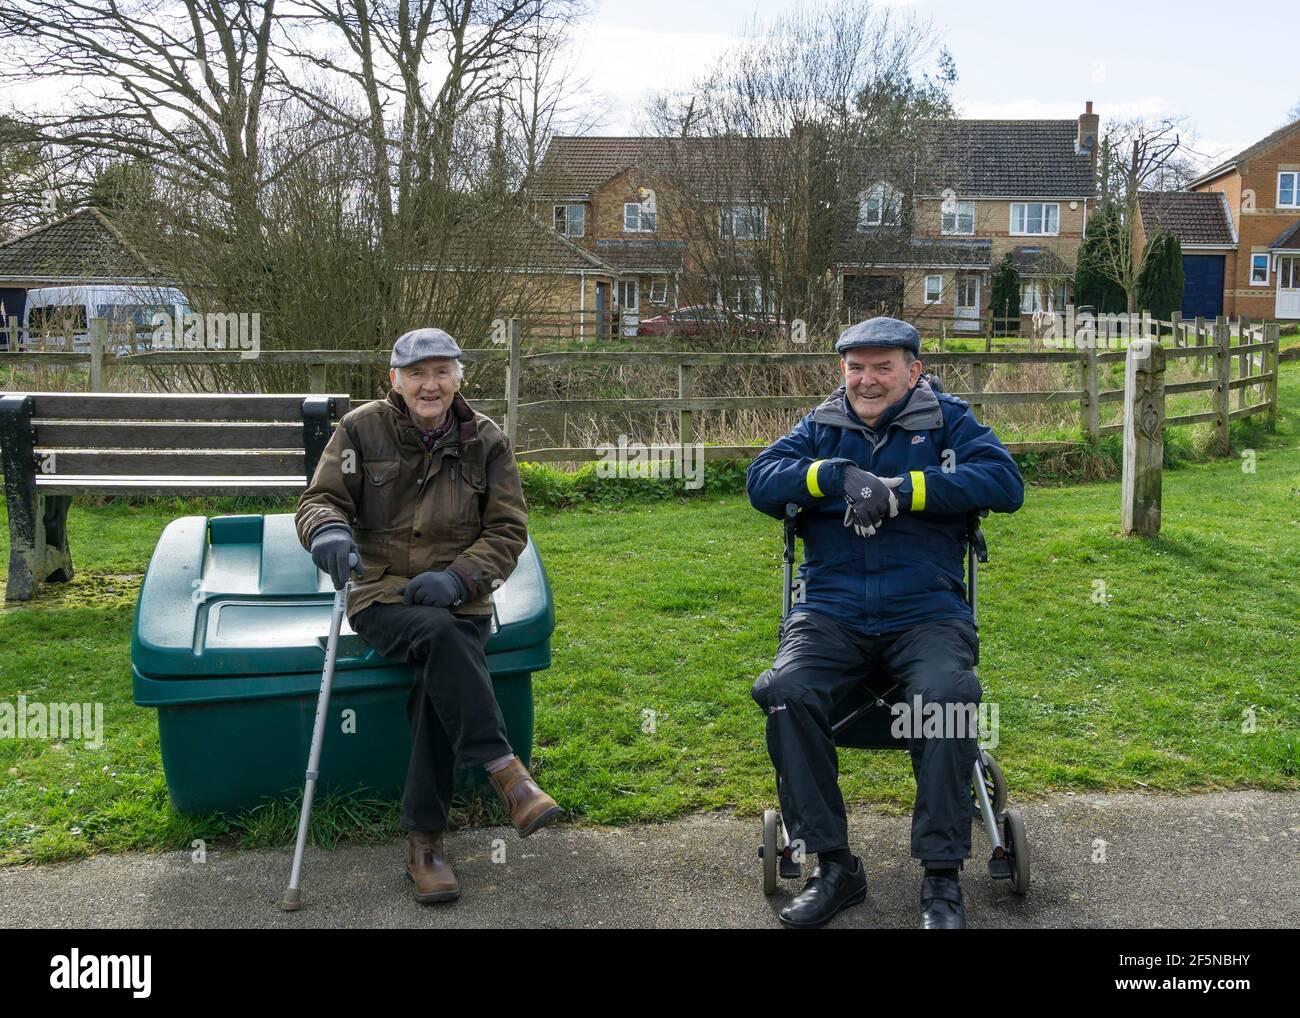 Two retired gentlemen having a breath of fresh air. Stock Photo